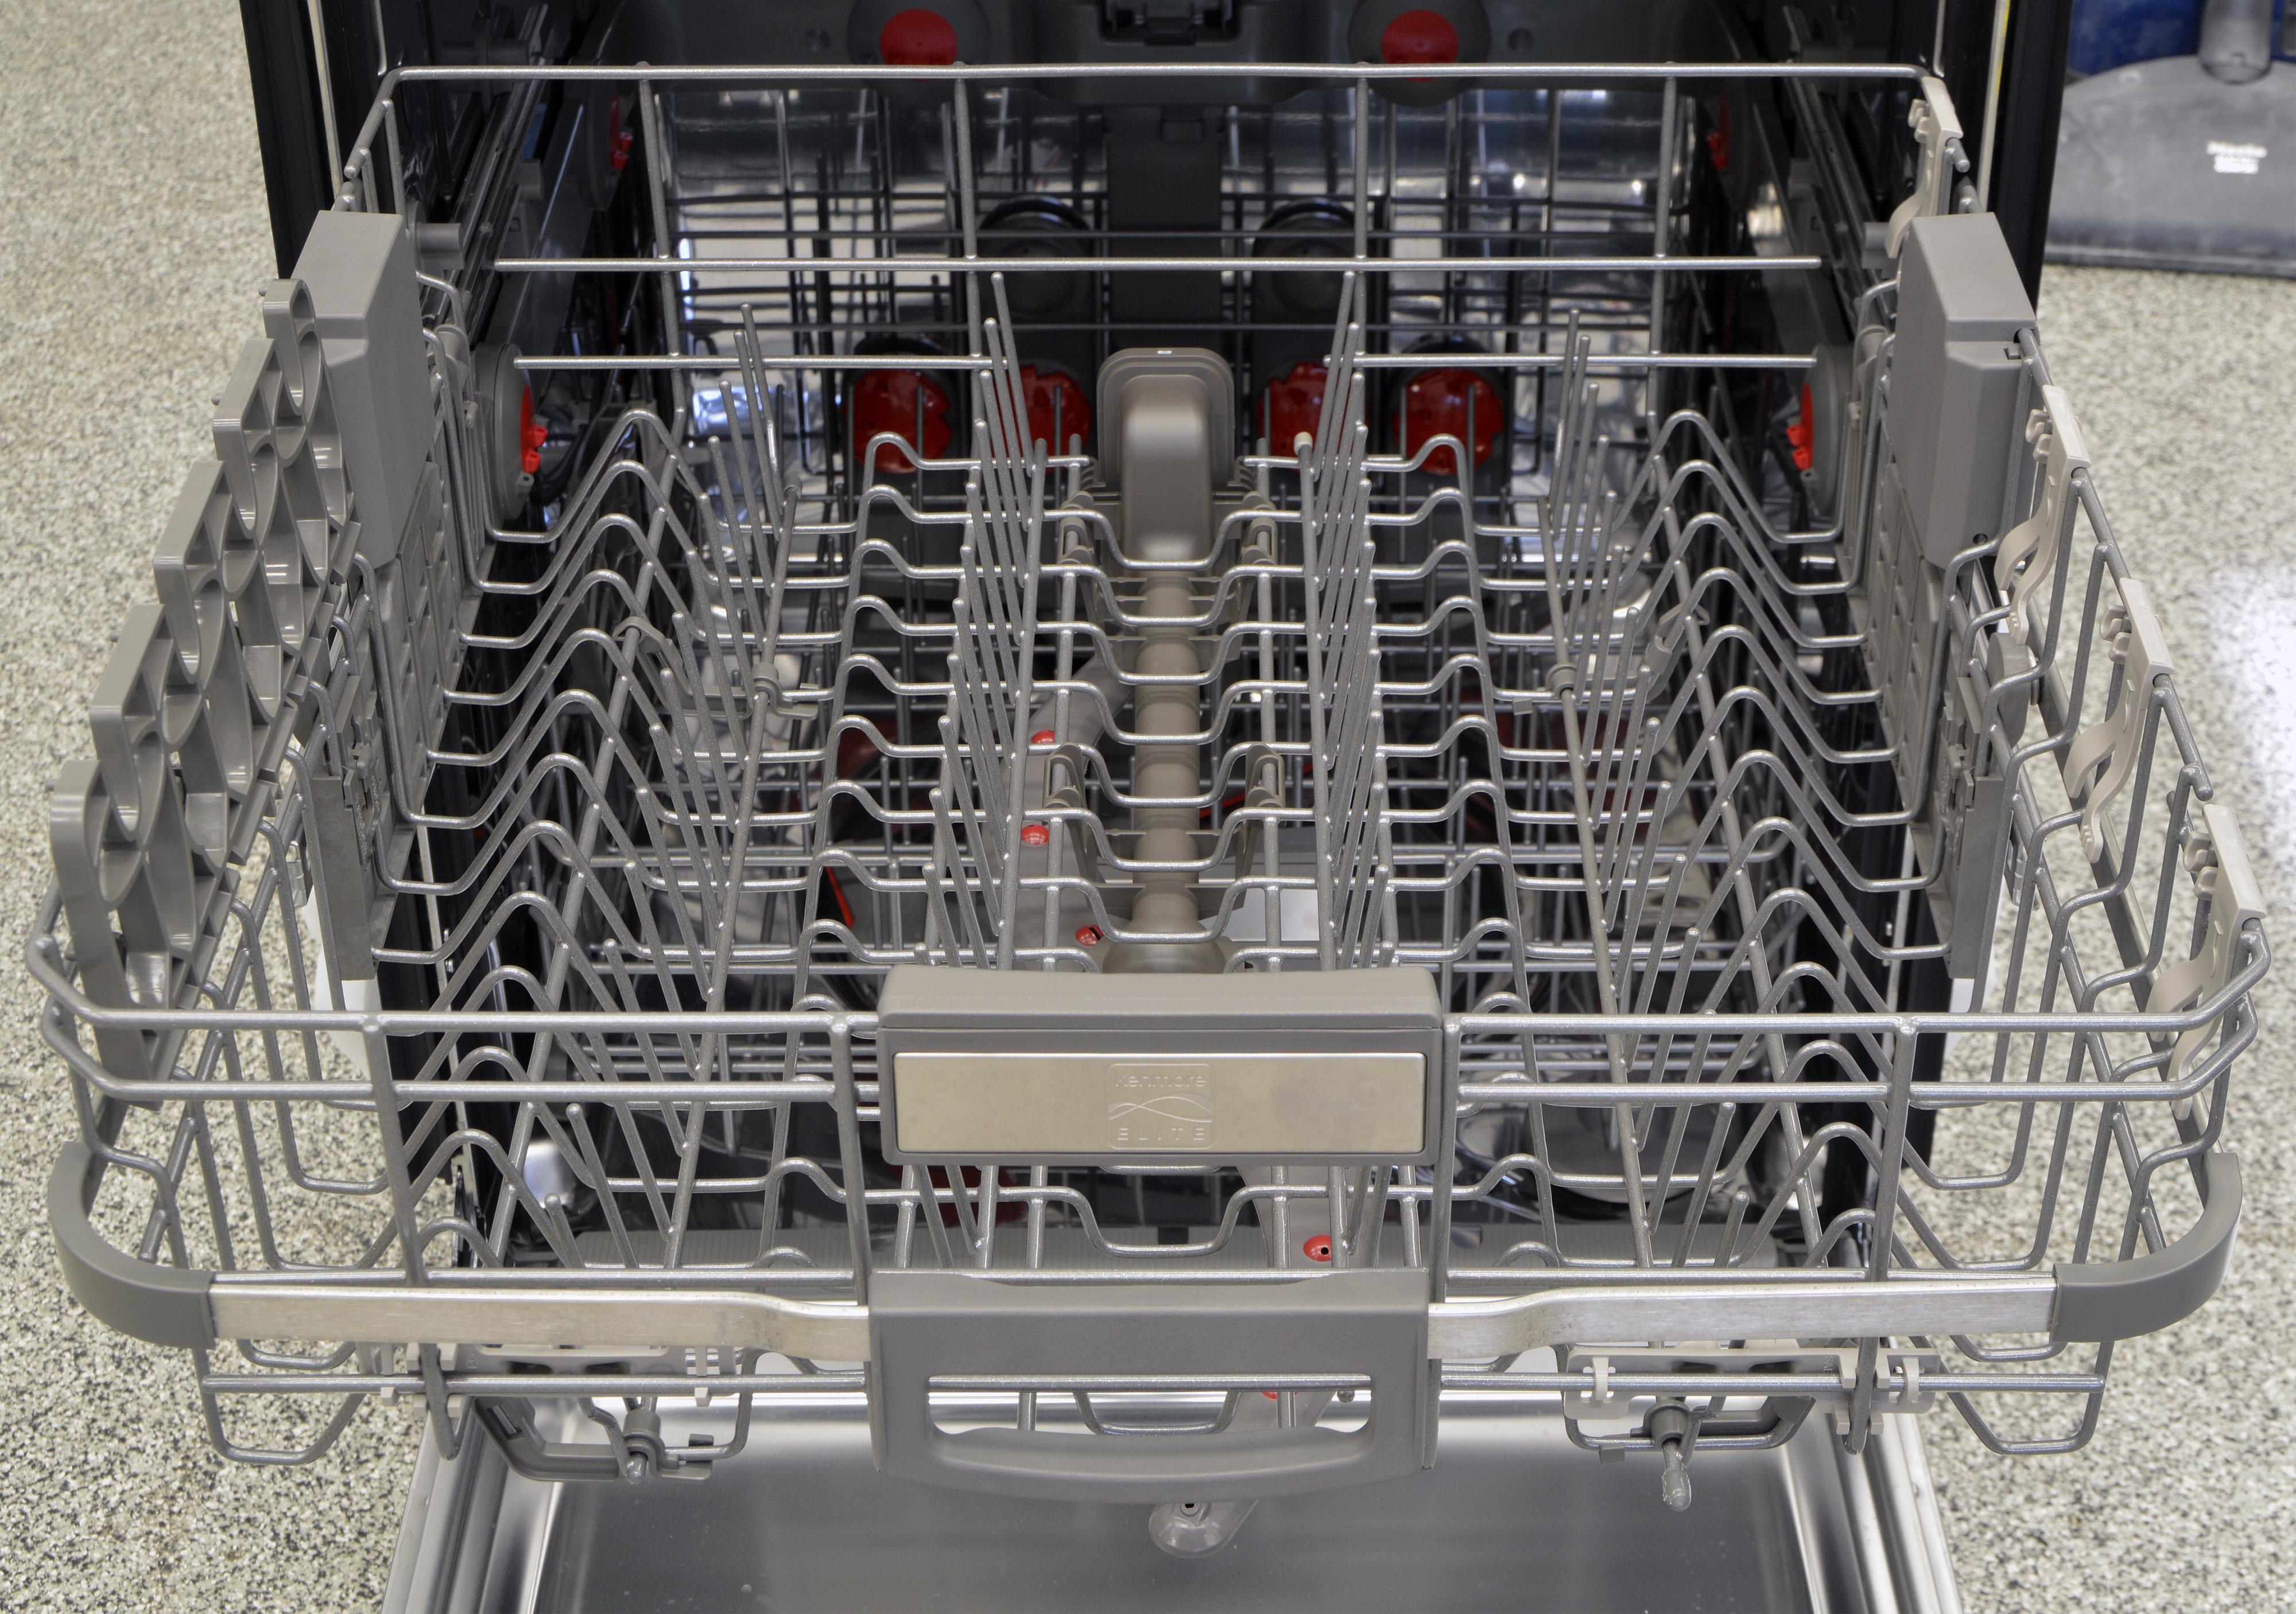 Kenmore Ultra Wash Quiet Guard novitech shredder bush tv helpline – Kenmore Elite Dishwasher Model 465 3333600 Wiring-diagram